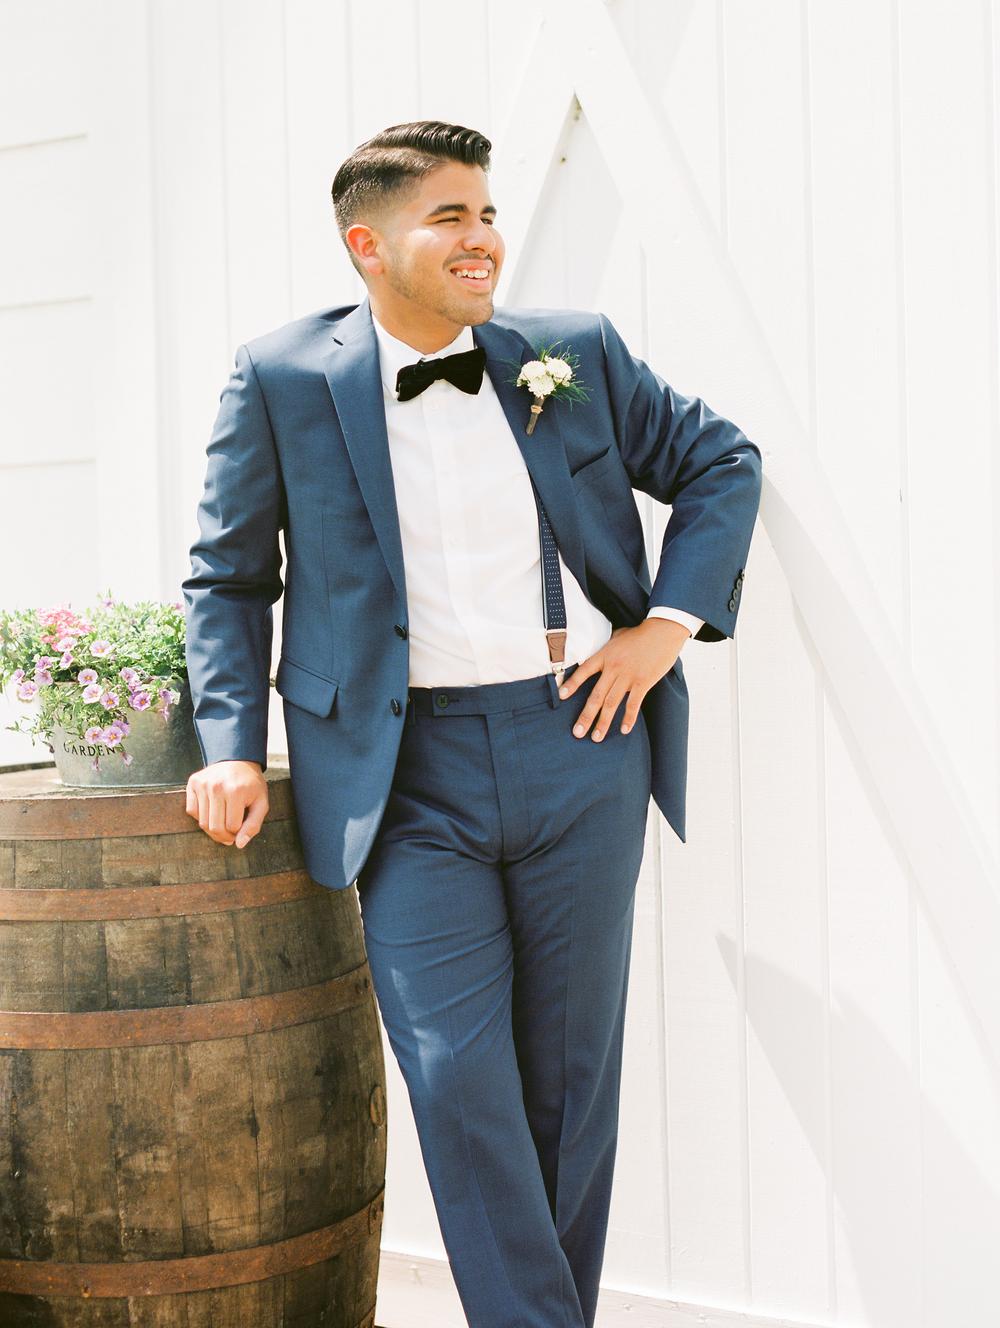 Sterling stables, brevard county FL wedding groom photo